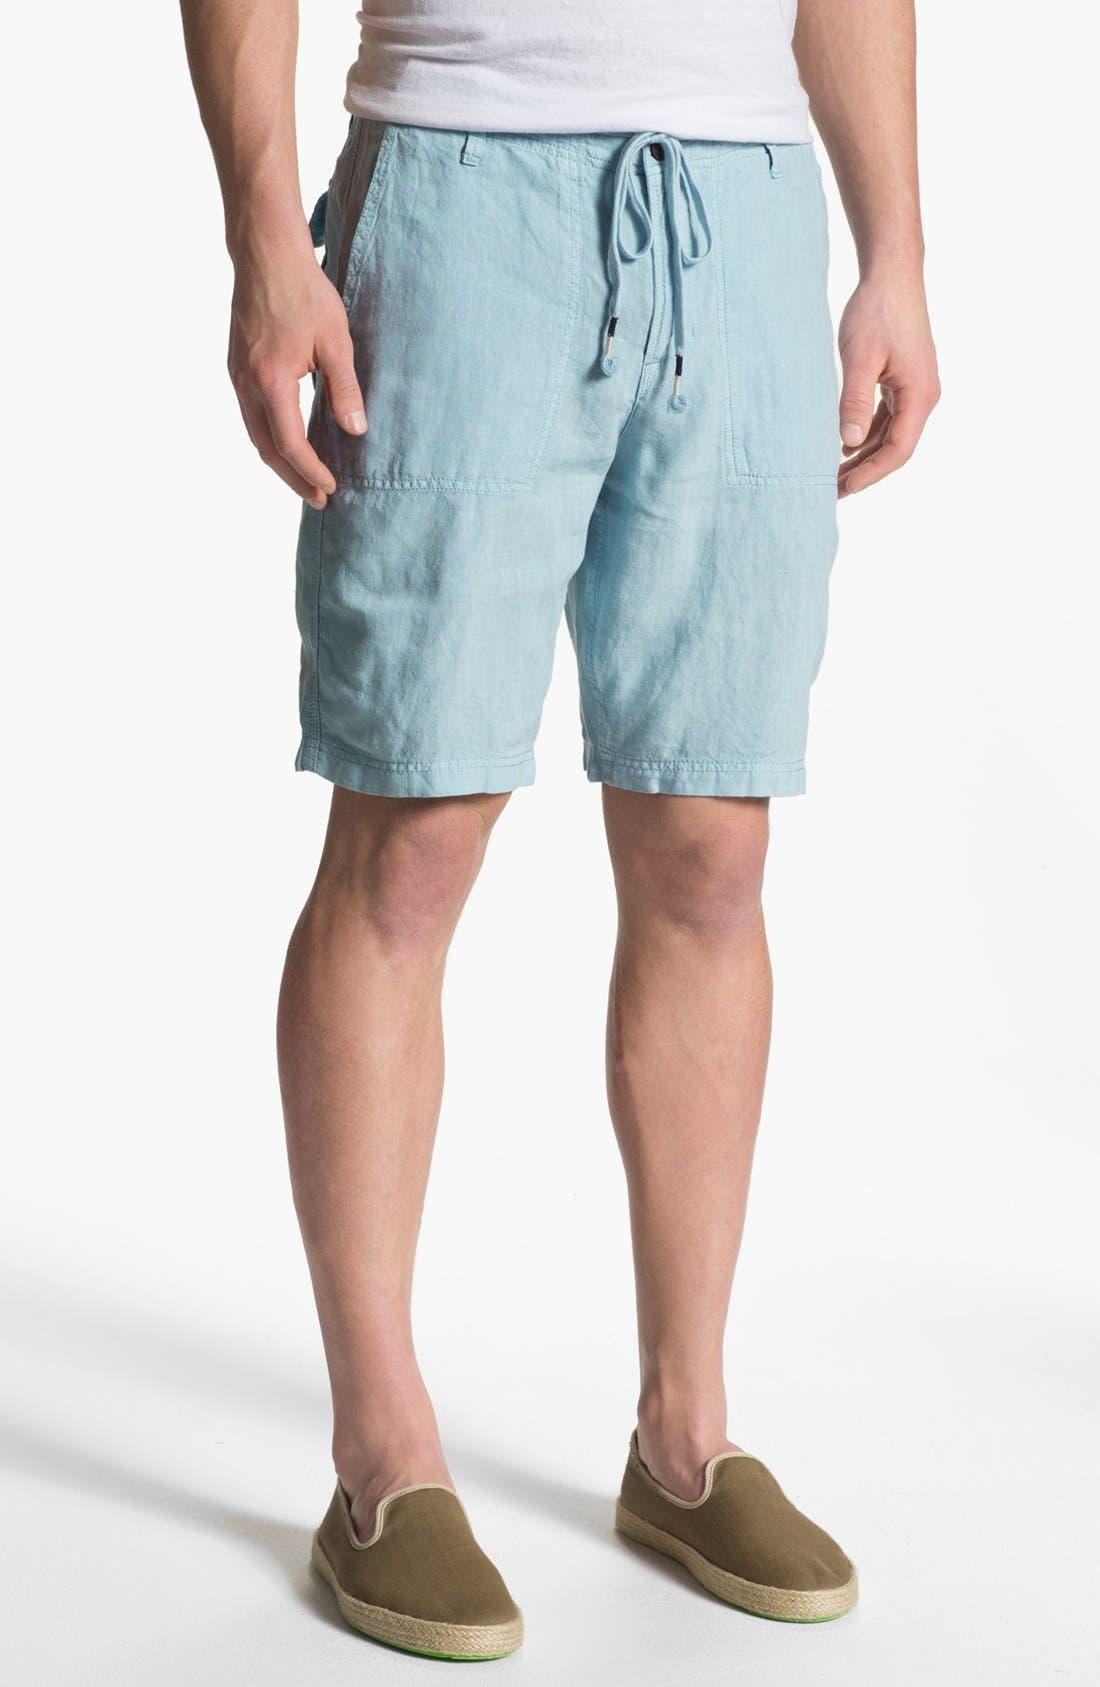 Alternate Image 1 Selected - Lucky Brand 'Vermont' Linen Shorts